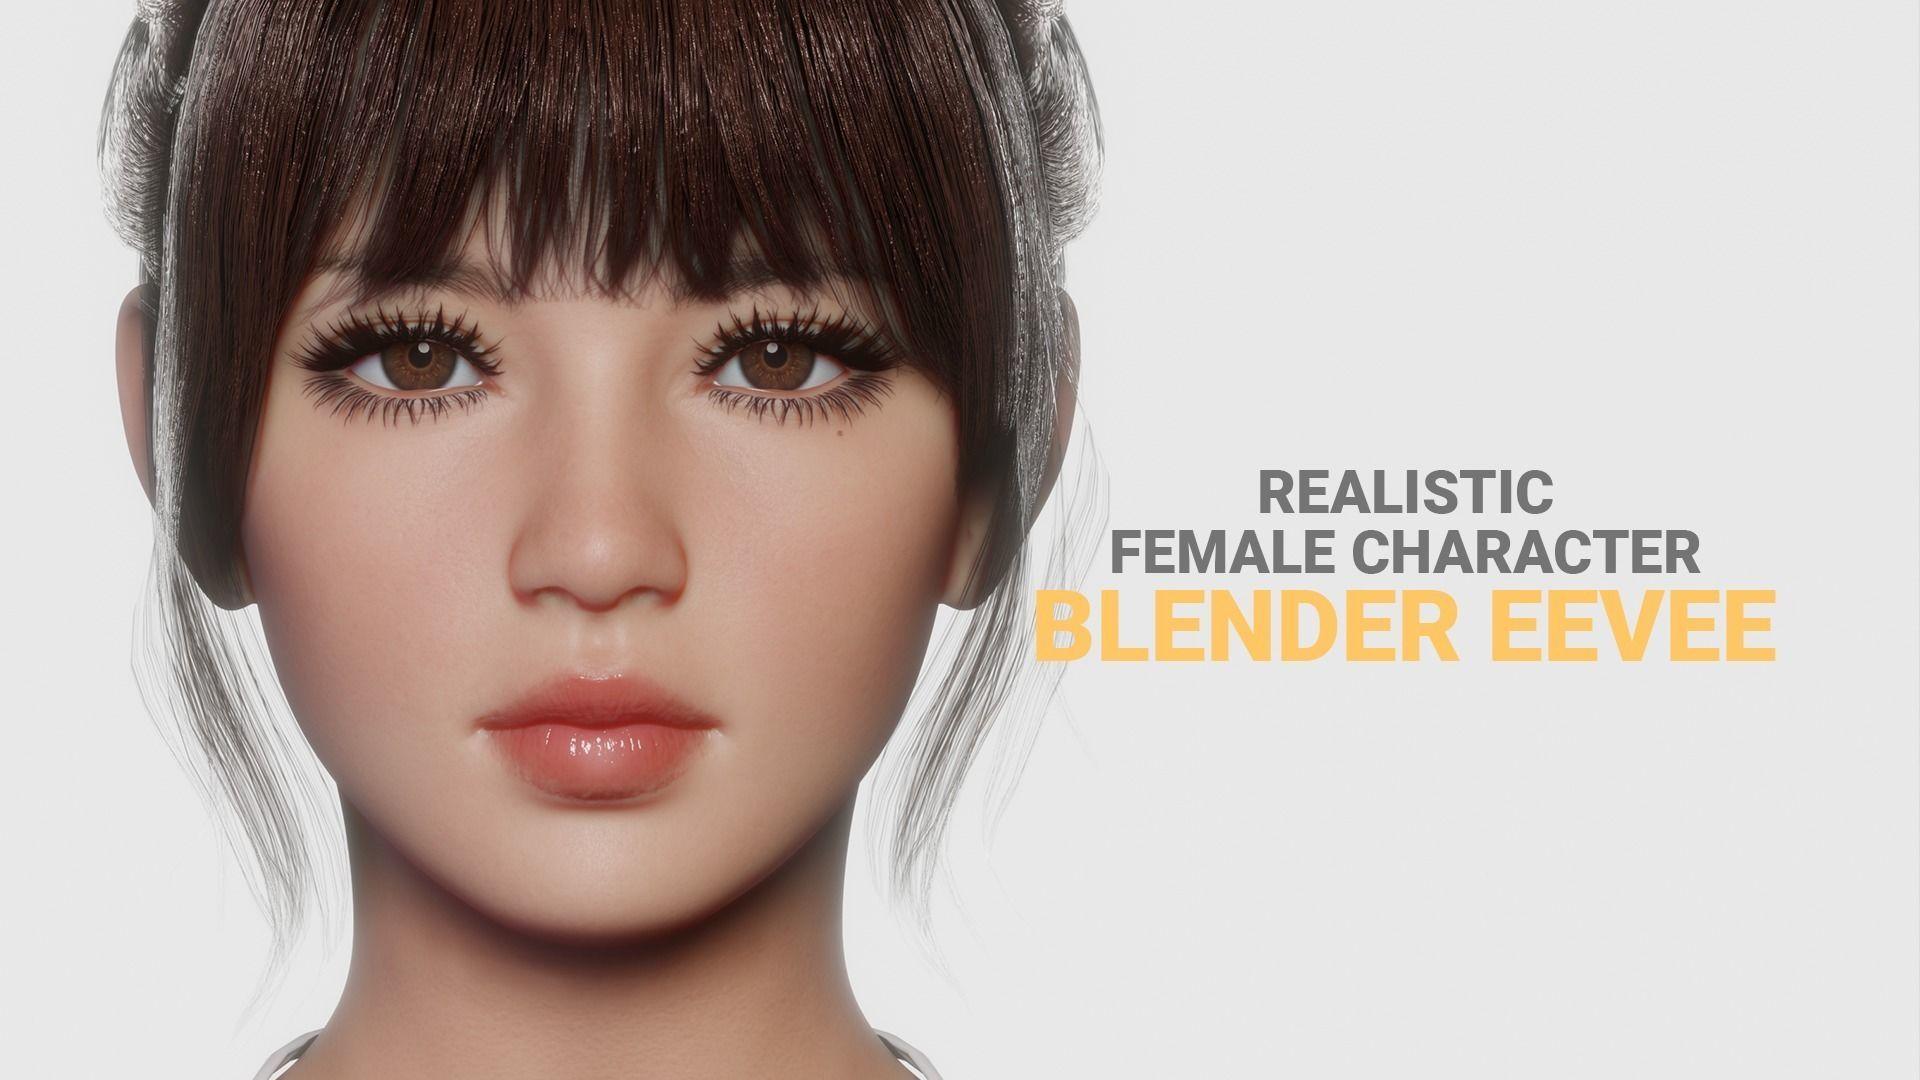 JOY - Realistic Female Character